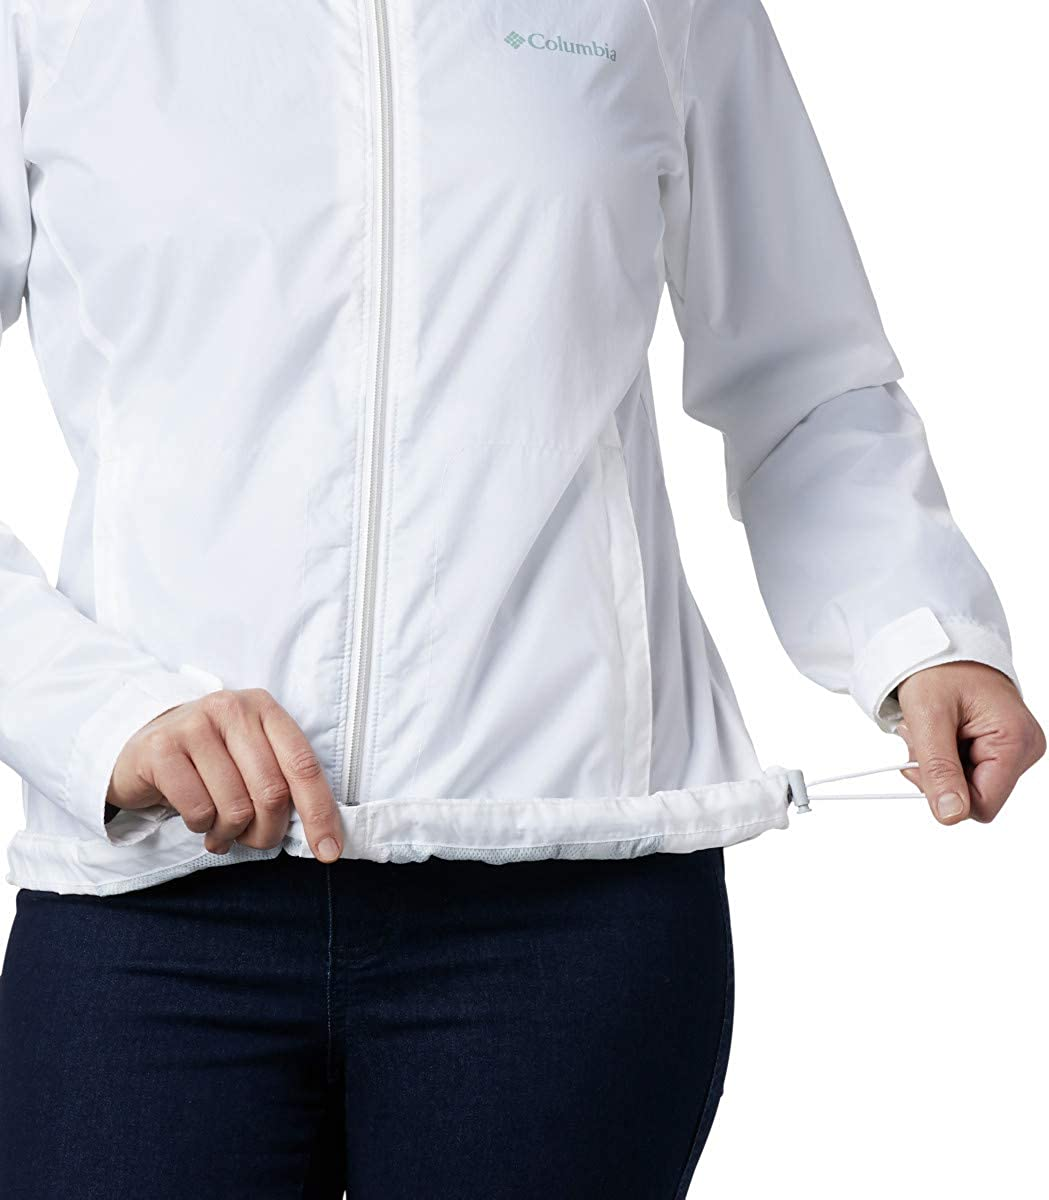 Columbia Damen Waterproof and Breathable Regenjacke Weiß